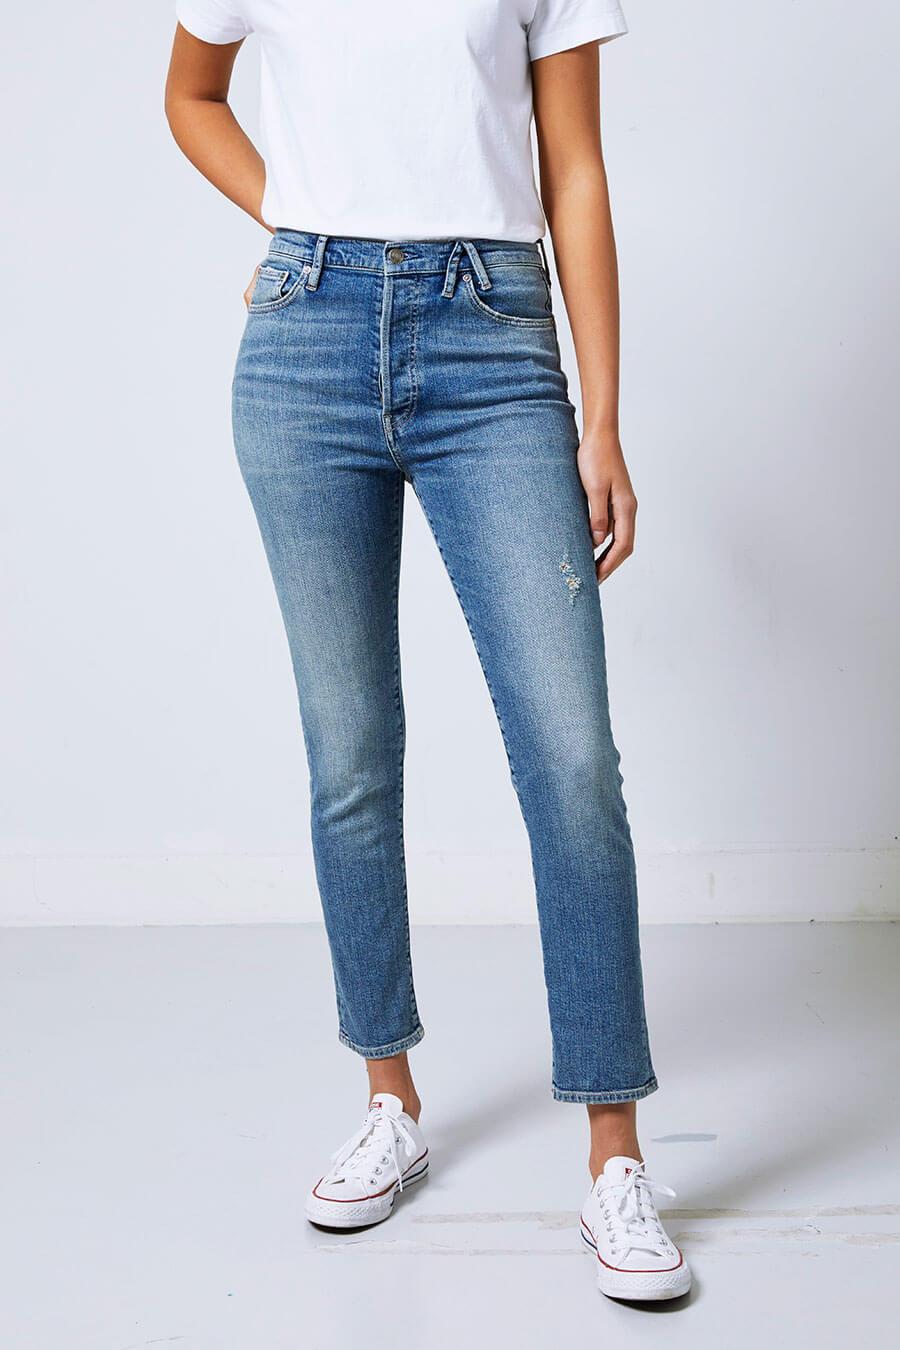 jacy Jeans